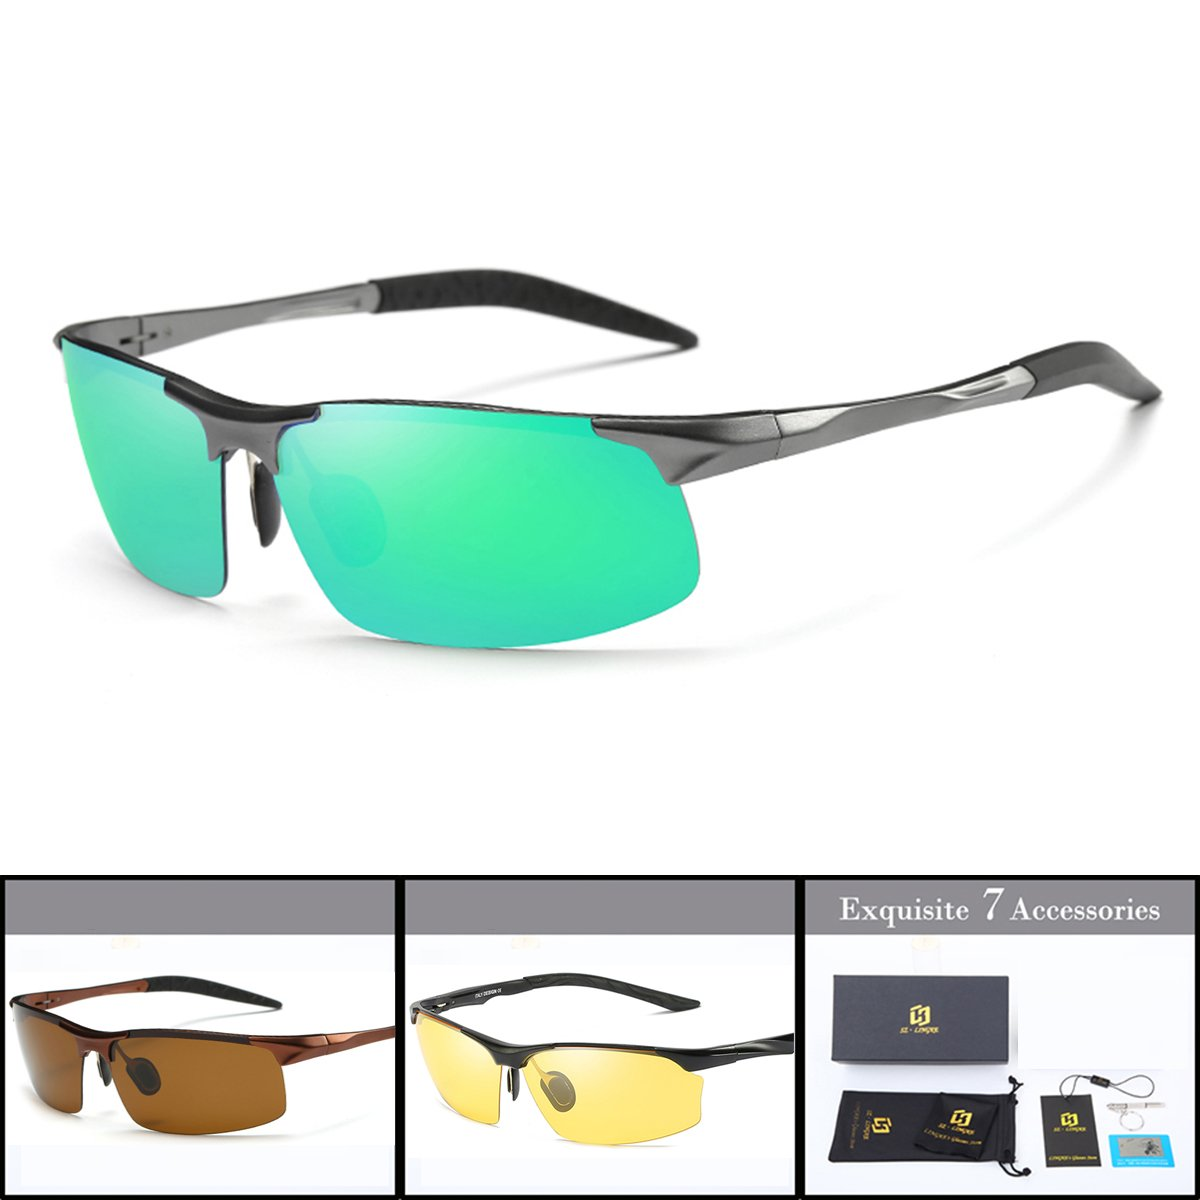 SZLINGKE Brand Polarized Sport Sunglasses Women Men Riding Cycling Sunglasses Aluminum Magnesium Frameless Semi-Rimless Sunglasses Fishing Driving Night Vision EyeGlasses (Gun & Green)